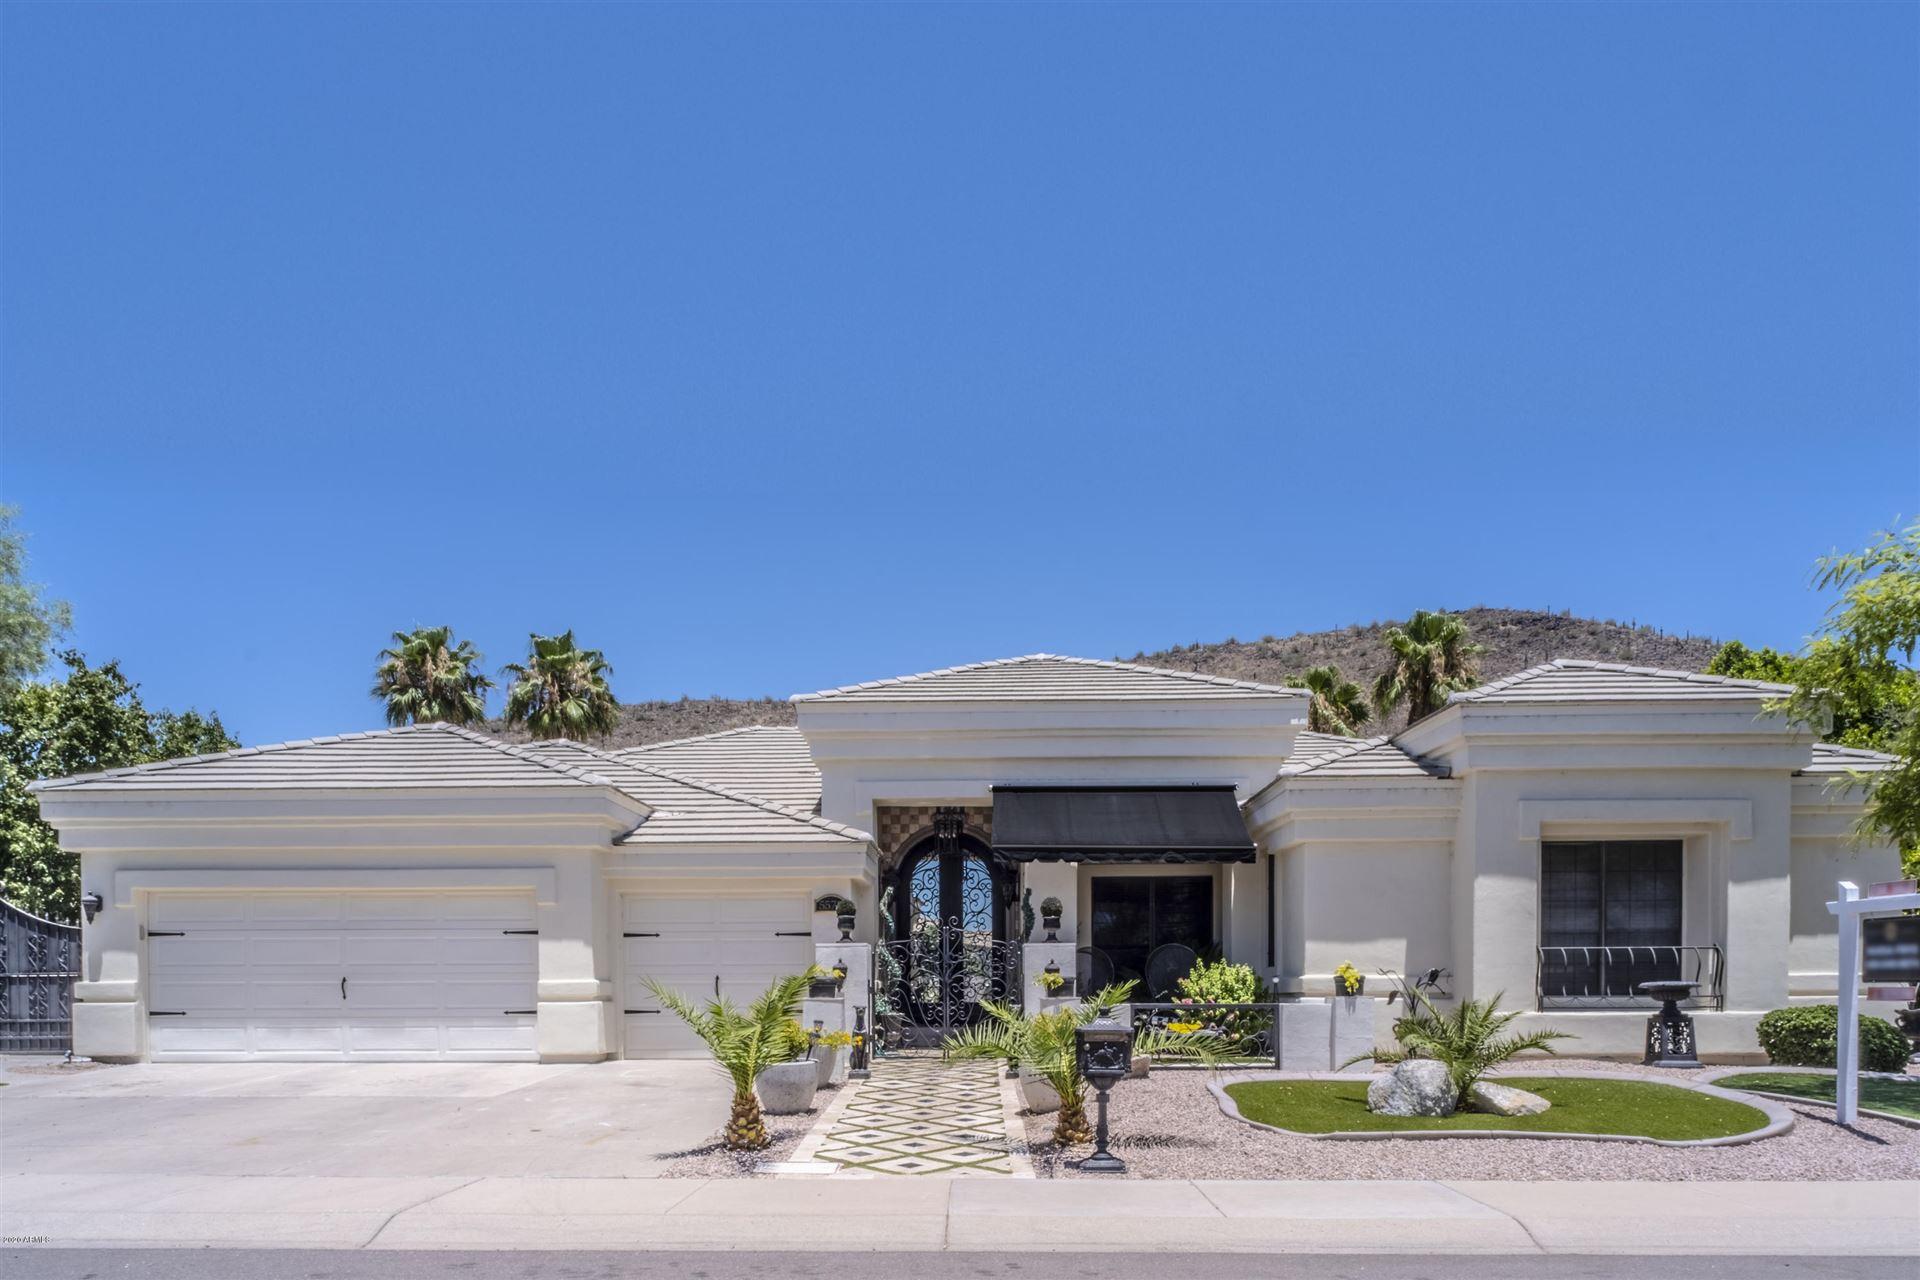 5572 W MELINDA Lane, Glendale, AZ 85308 - #: 6098368